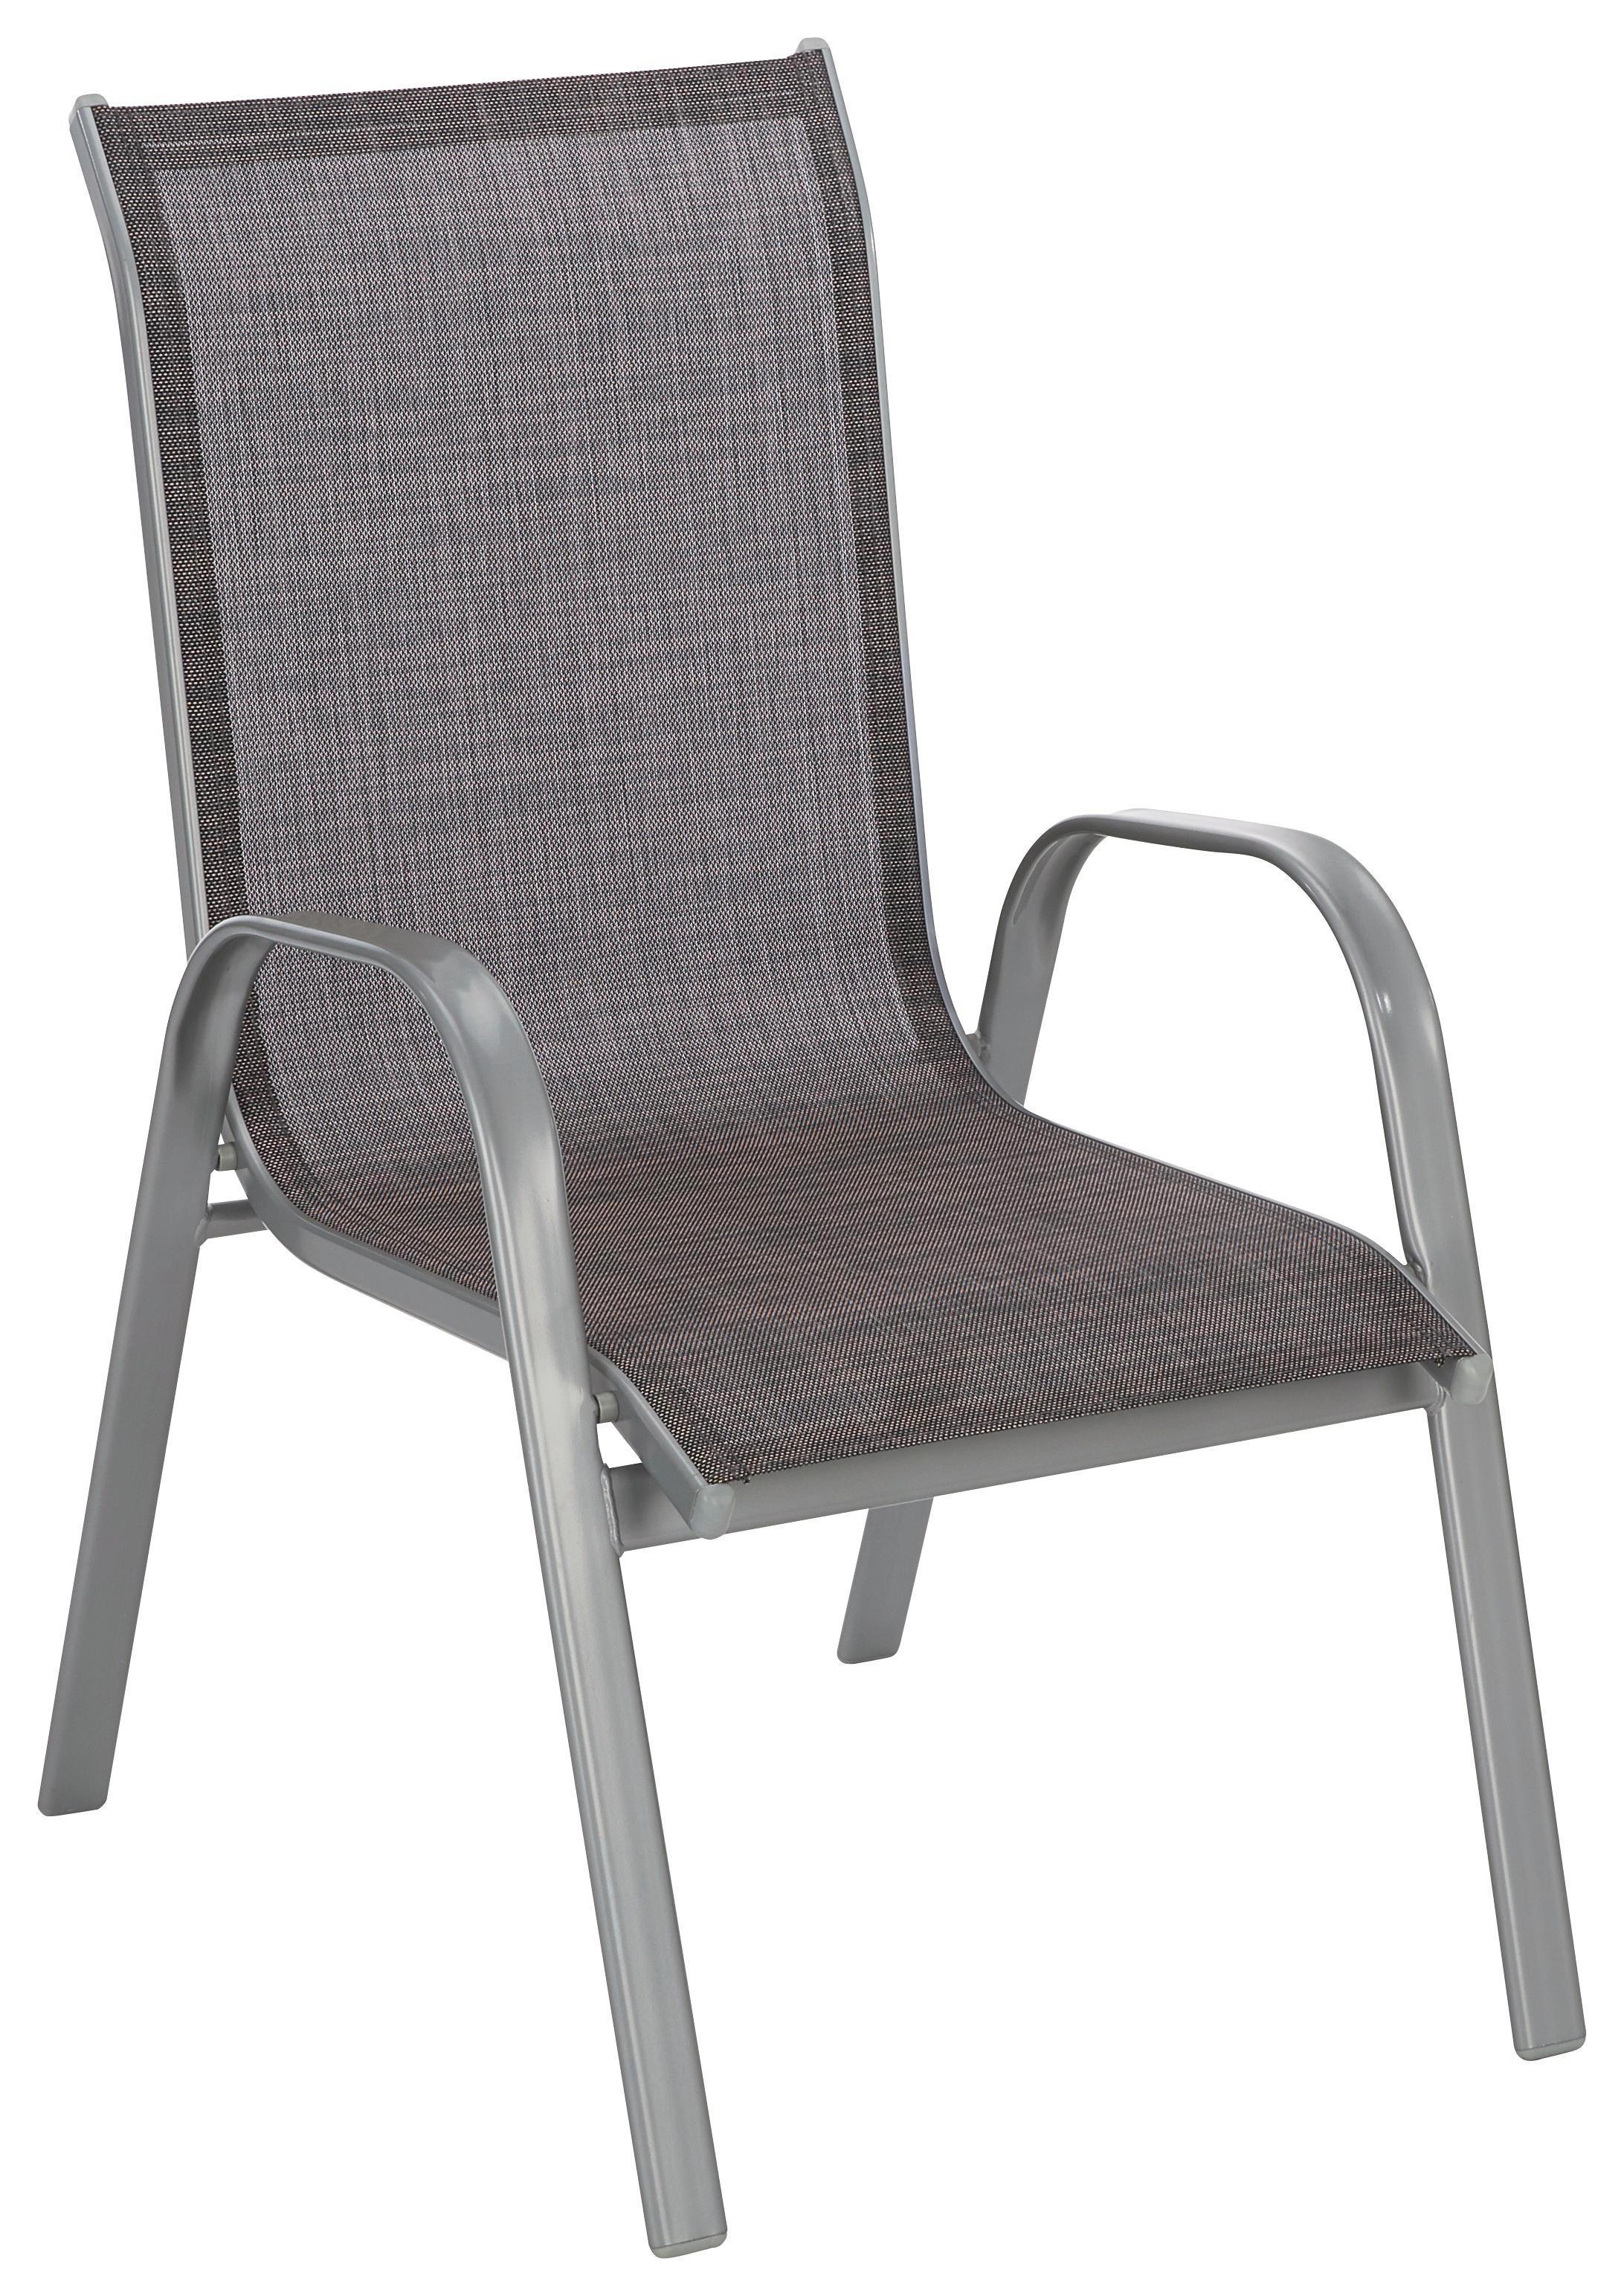 STAPELSESSEL Aluminium, Stahl Hellbraun, Silberfarben    Hellbraun/Silberfarben, Design, Textil/